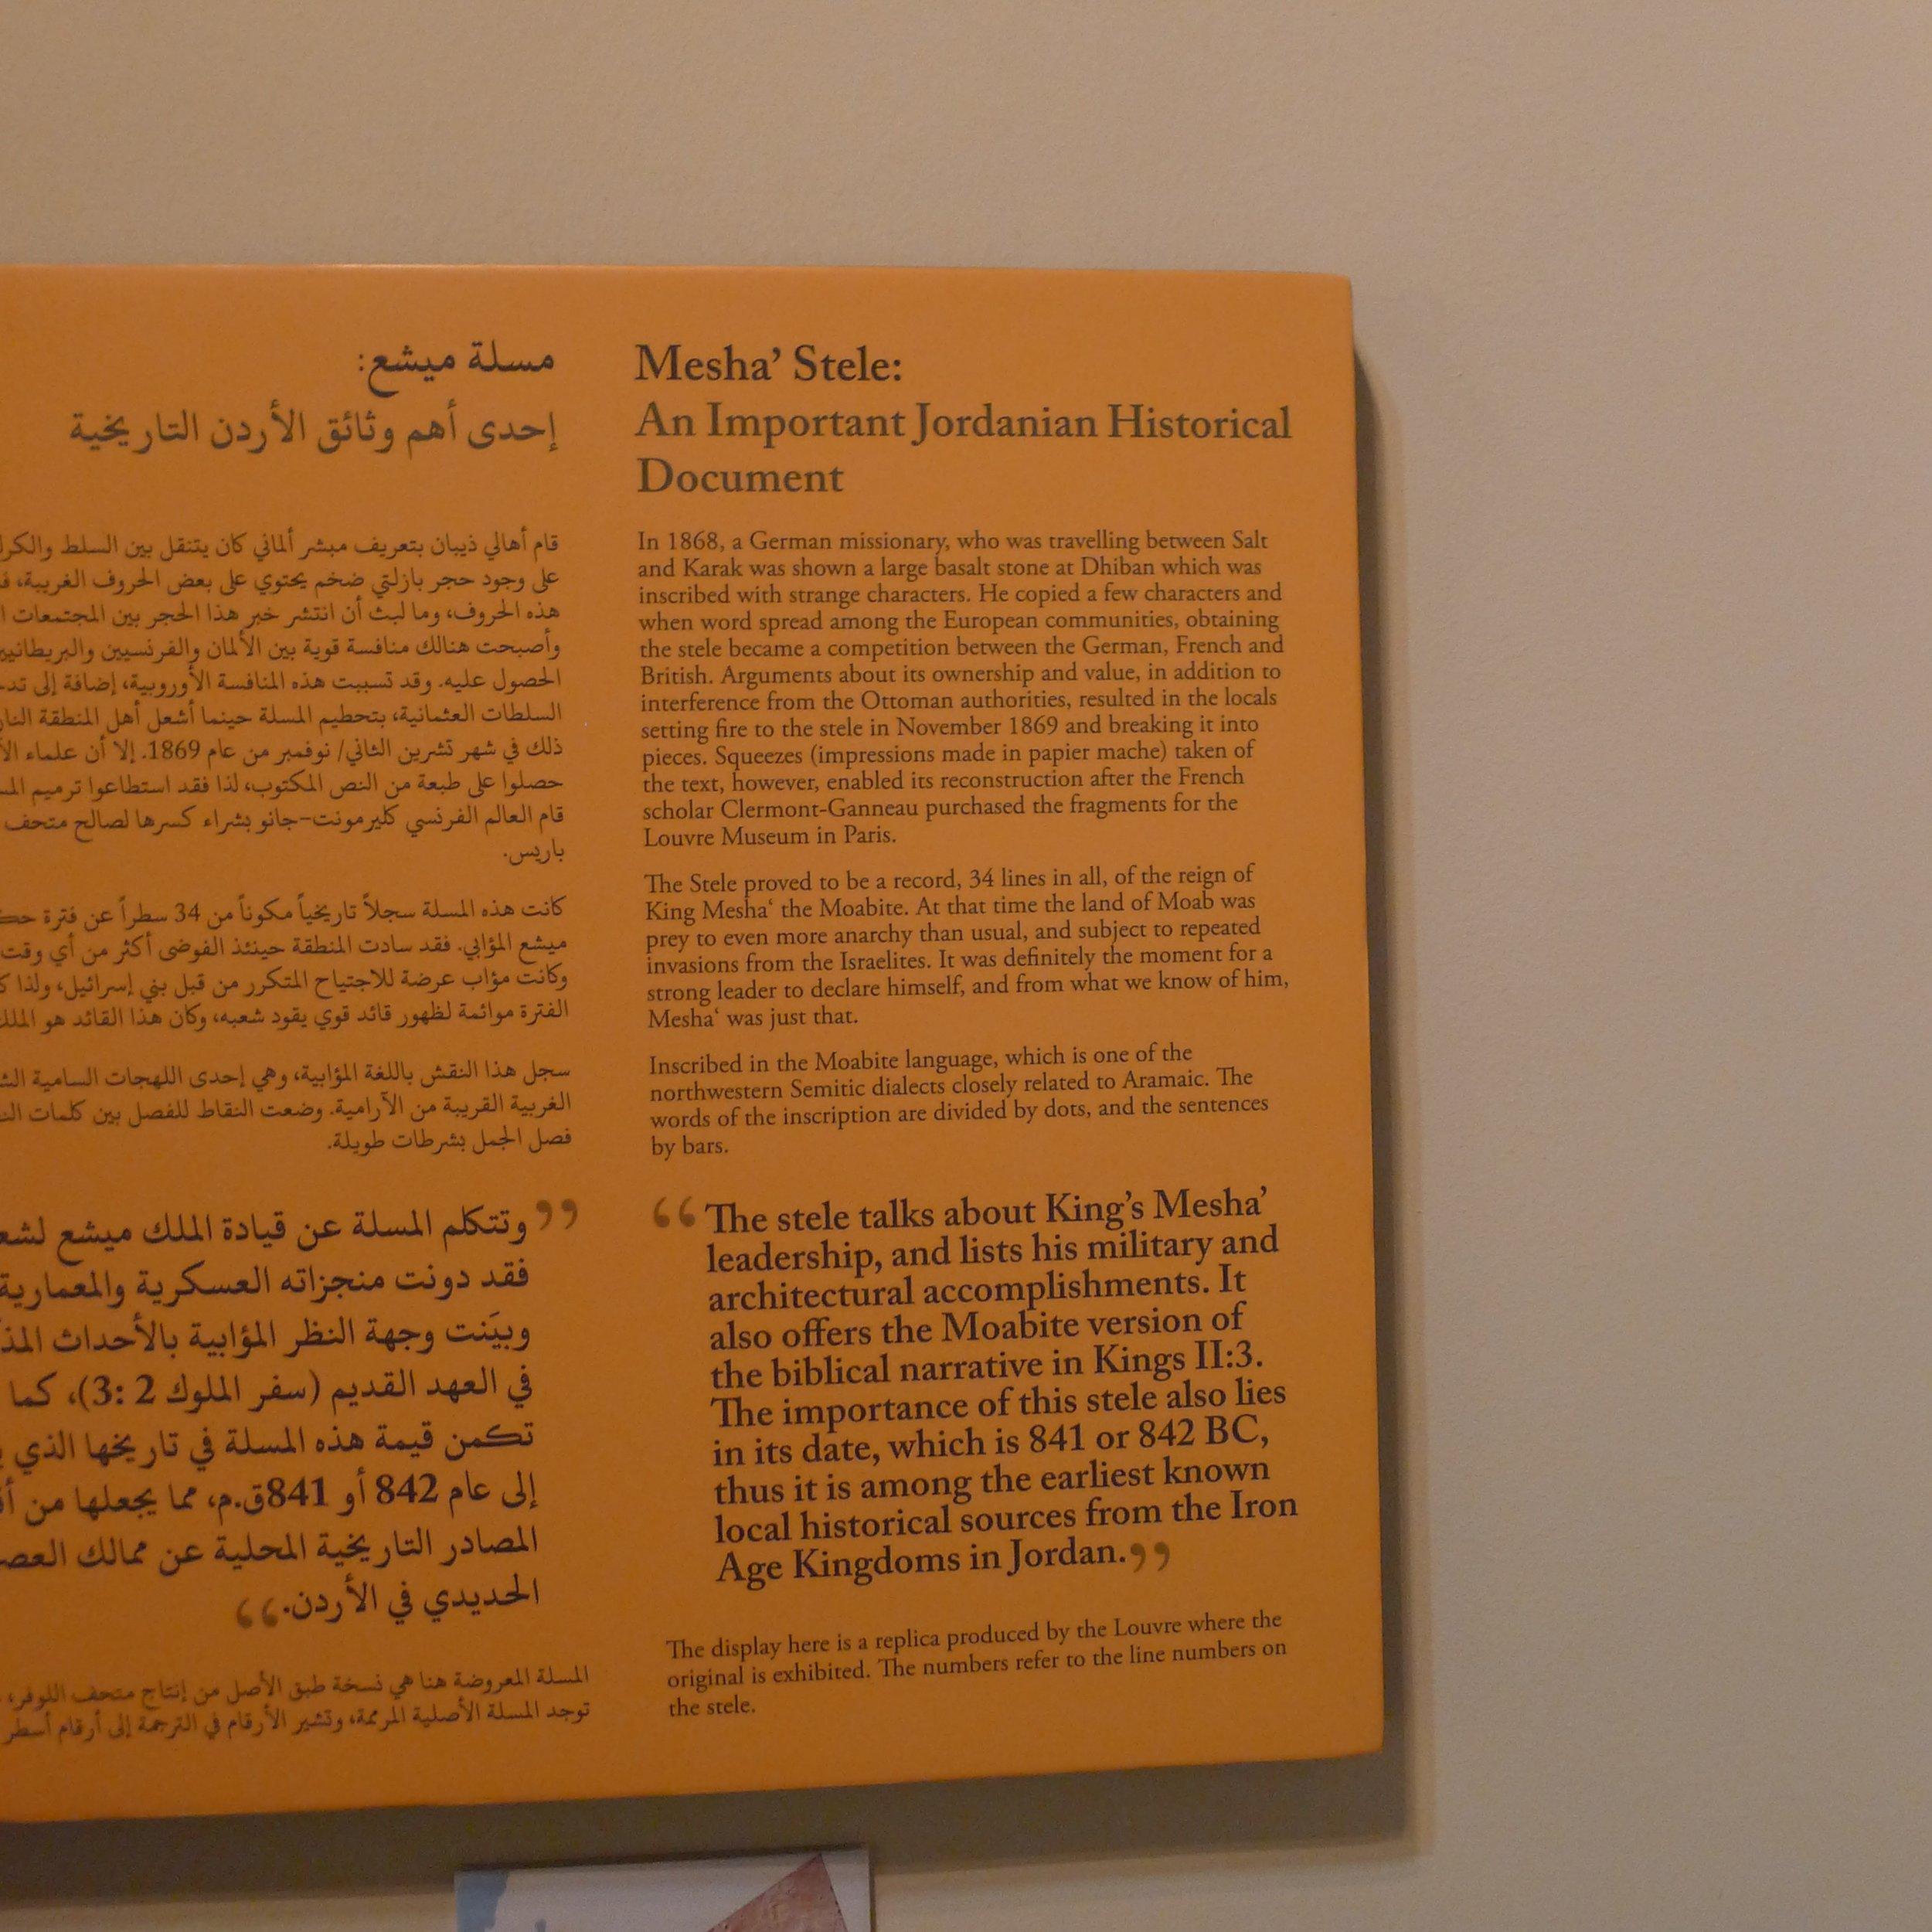 jordanmuseum 10.jpg